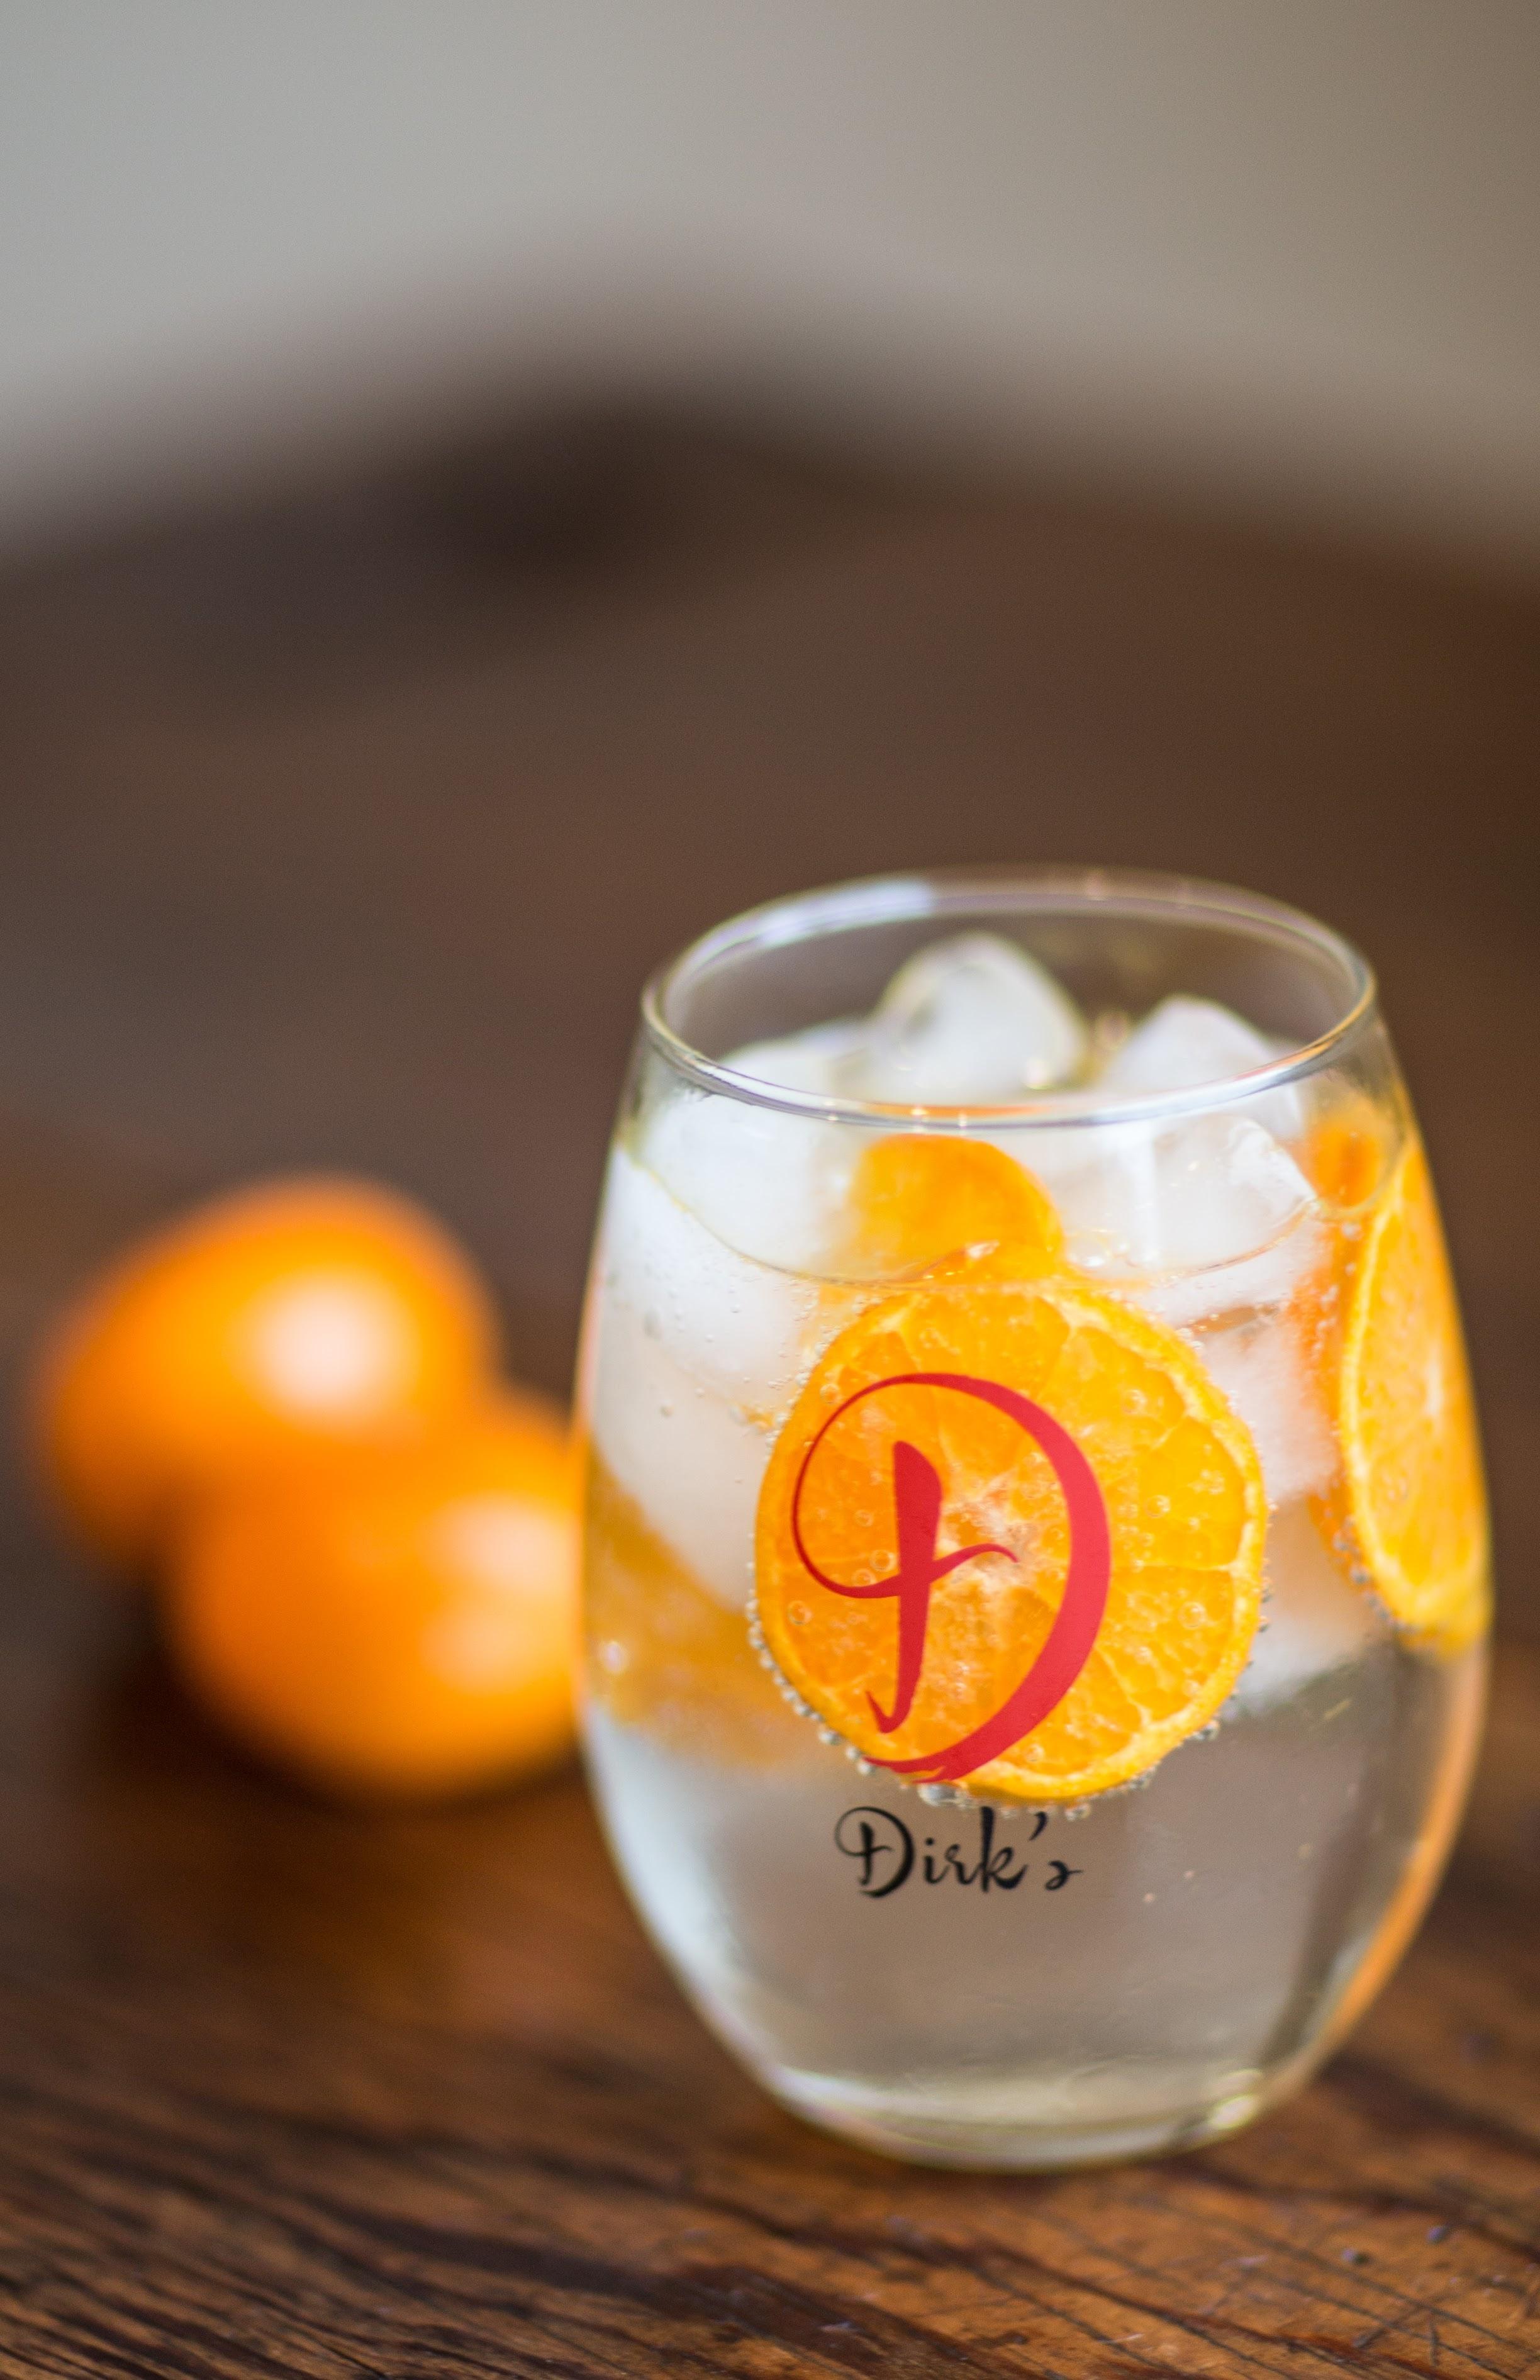 dirks_vodka_with_tangerine.jpg